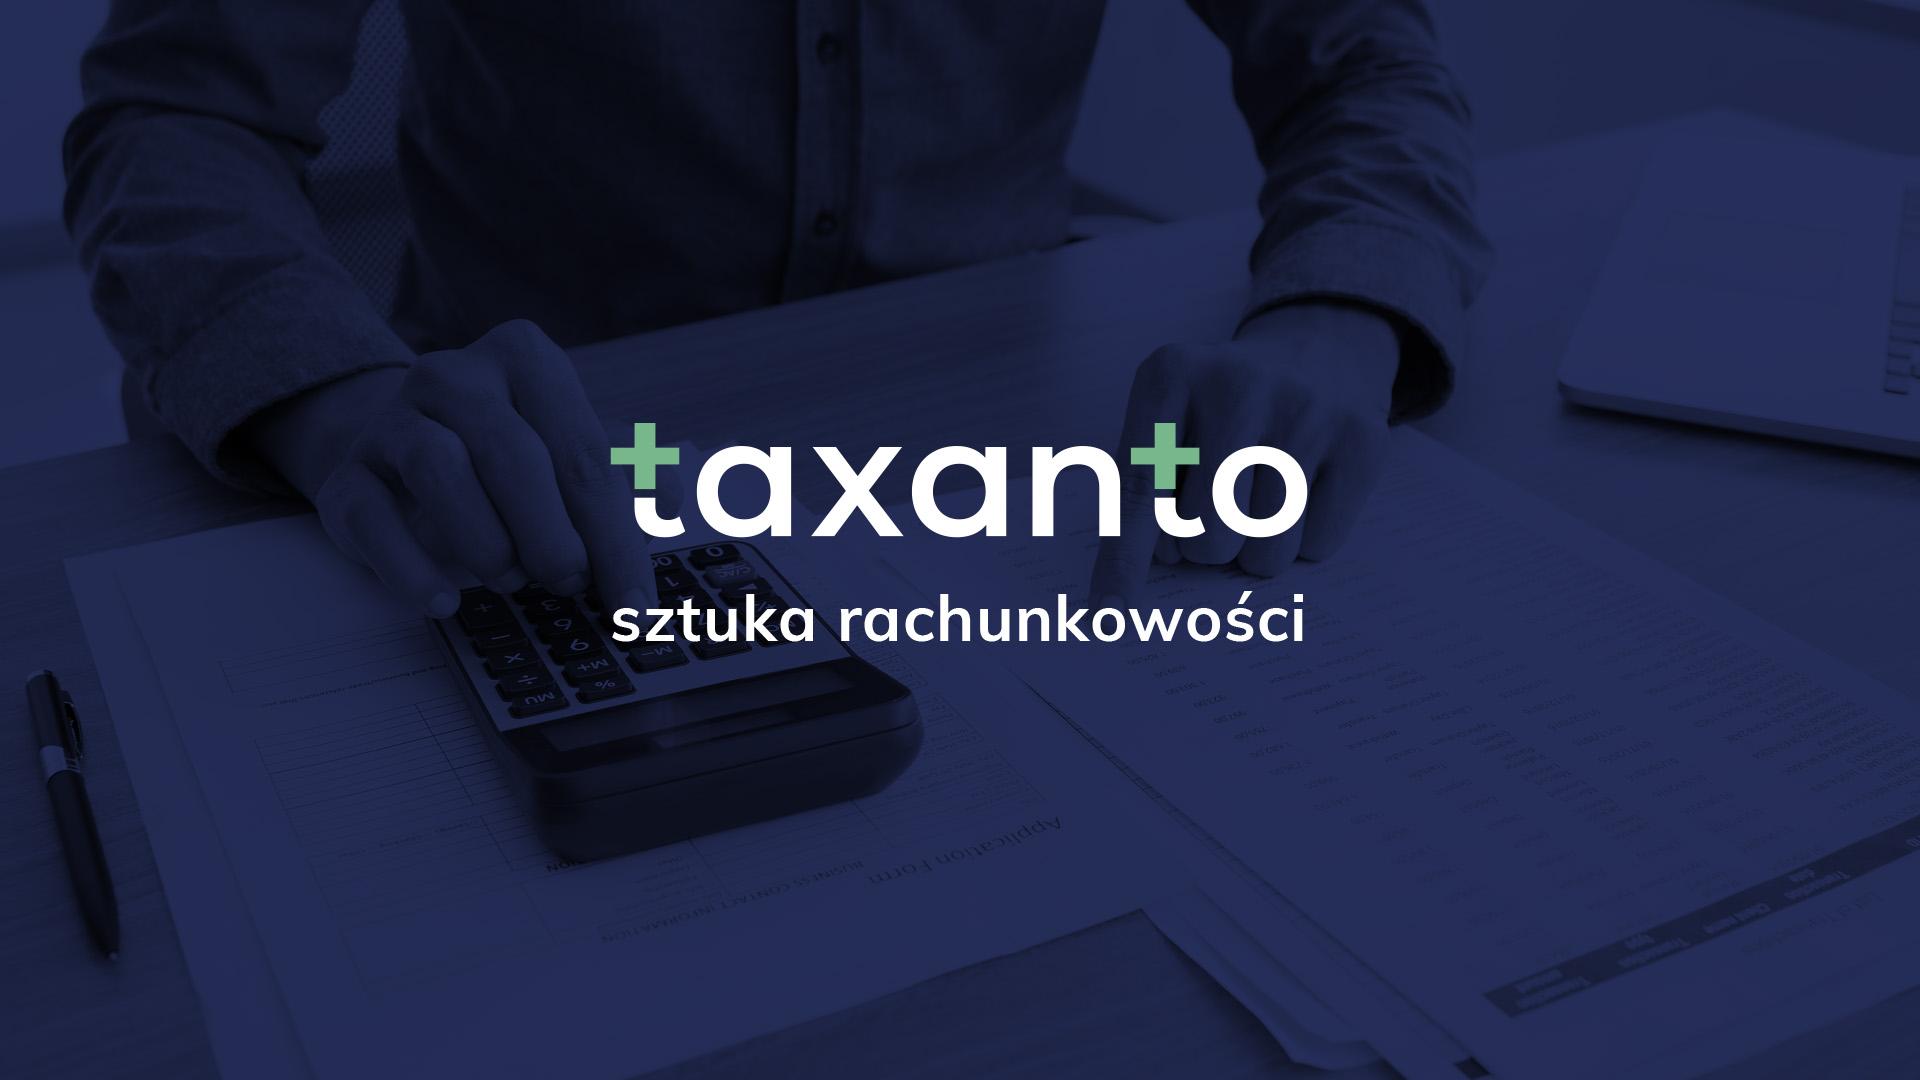 Taxanto